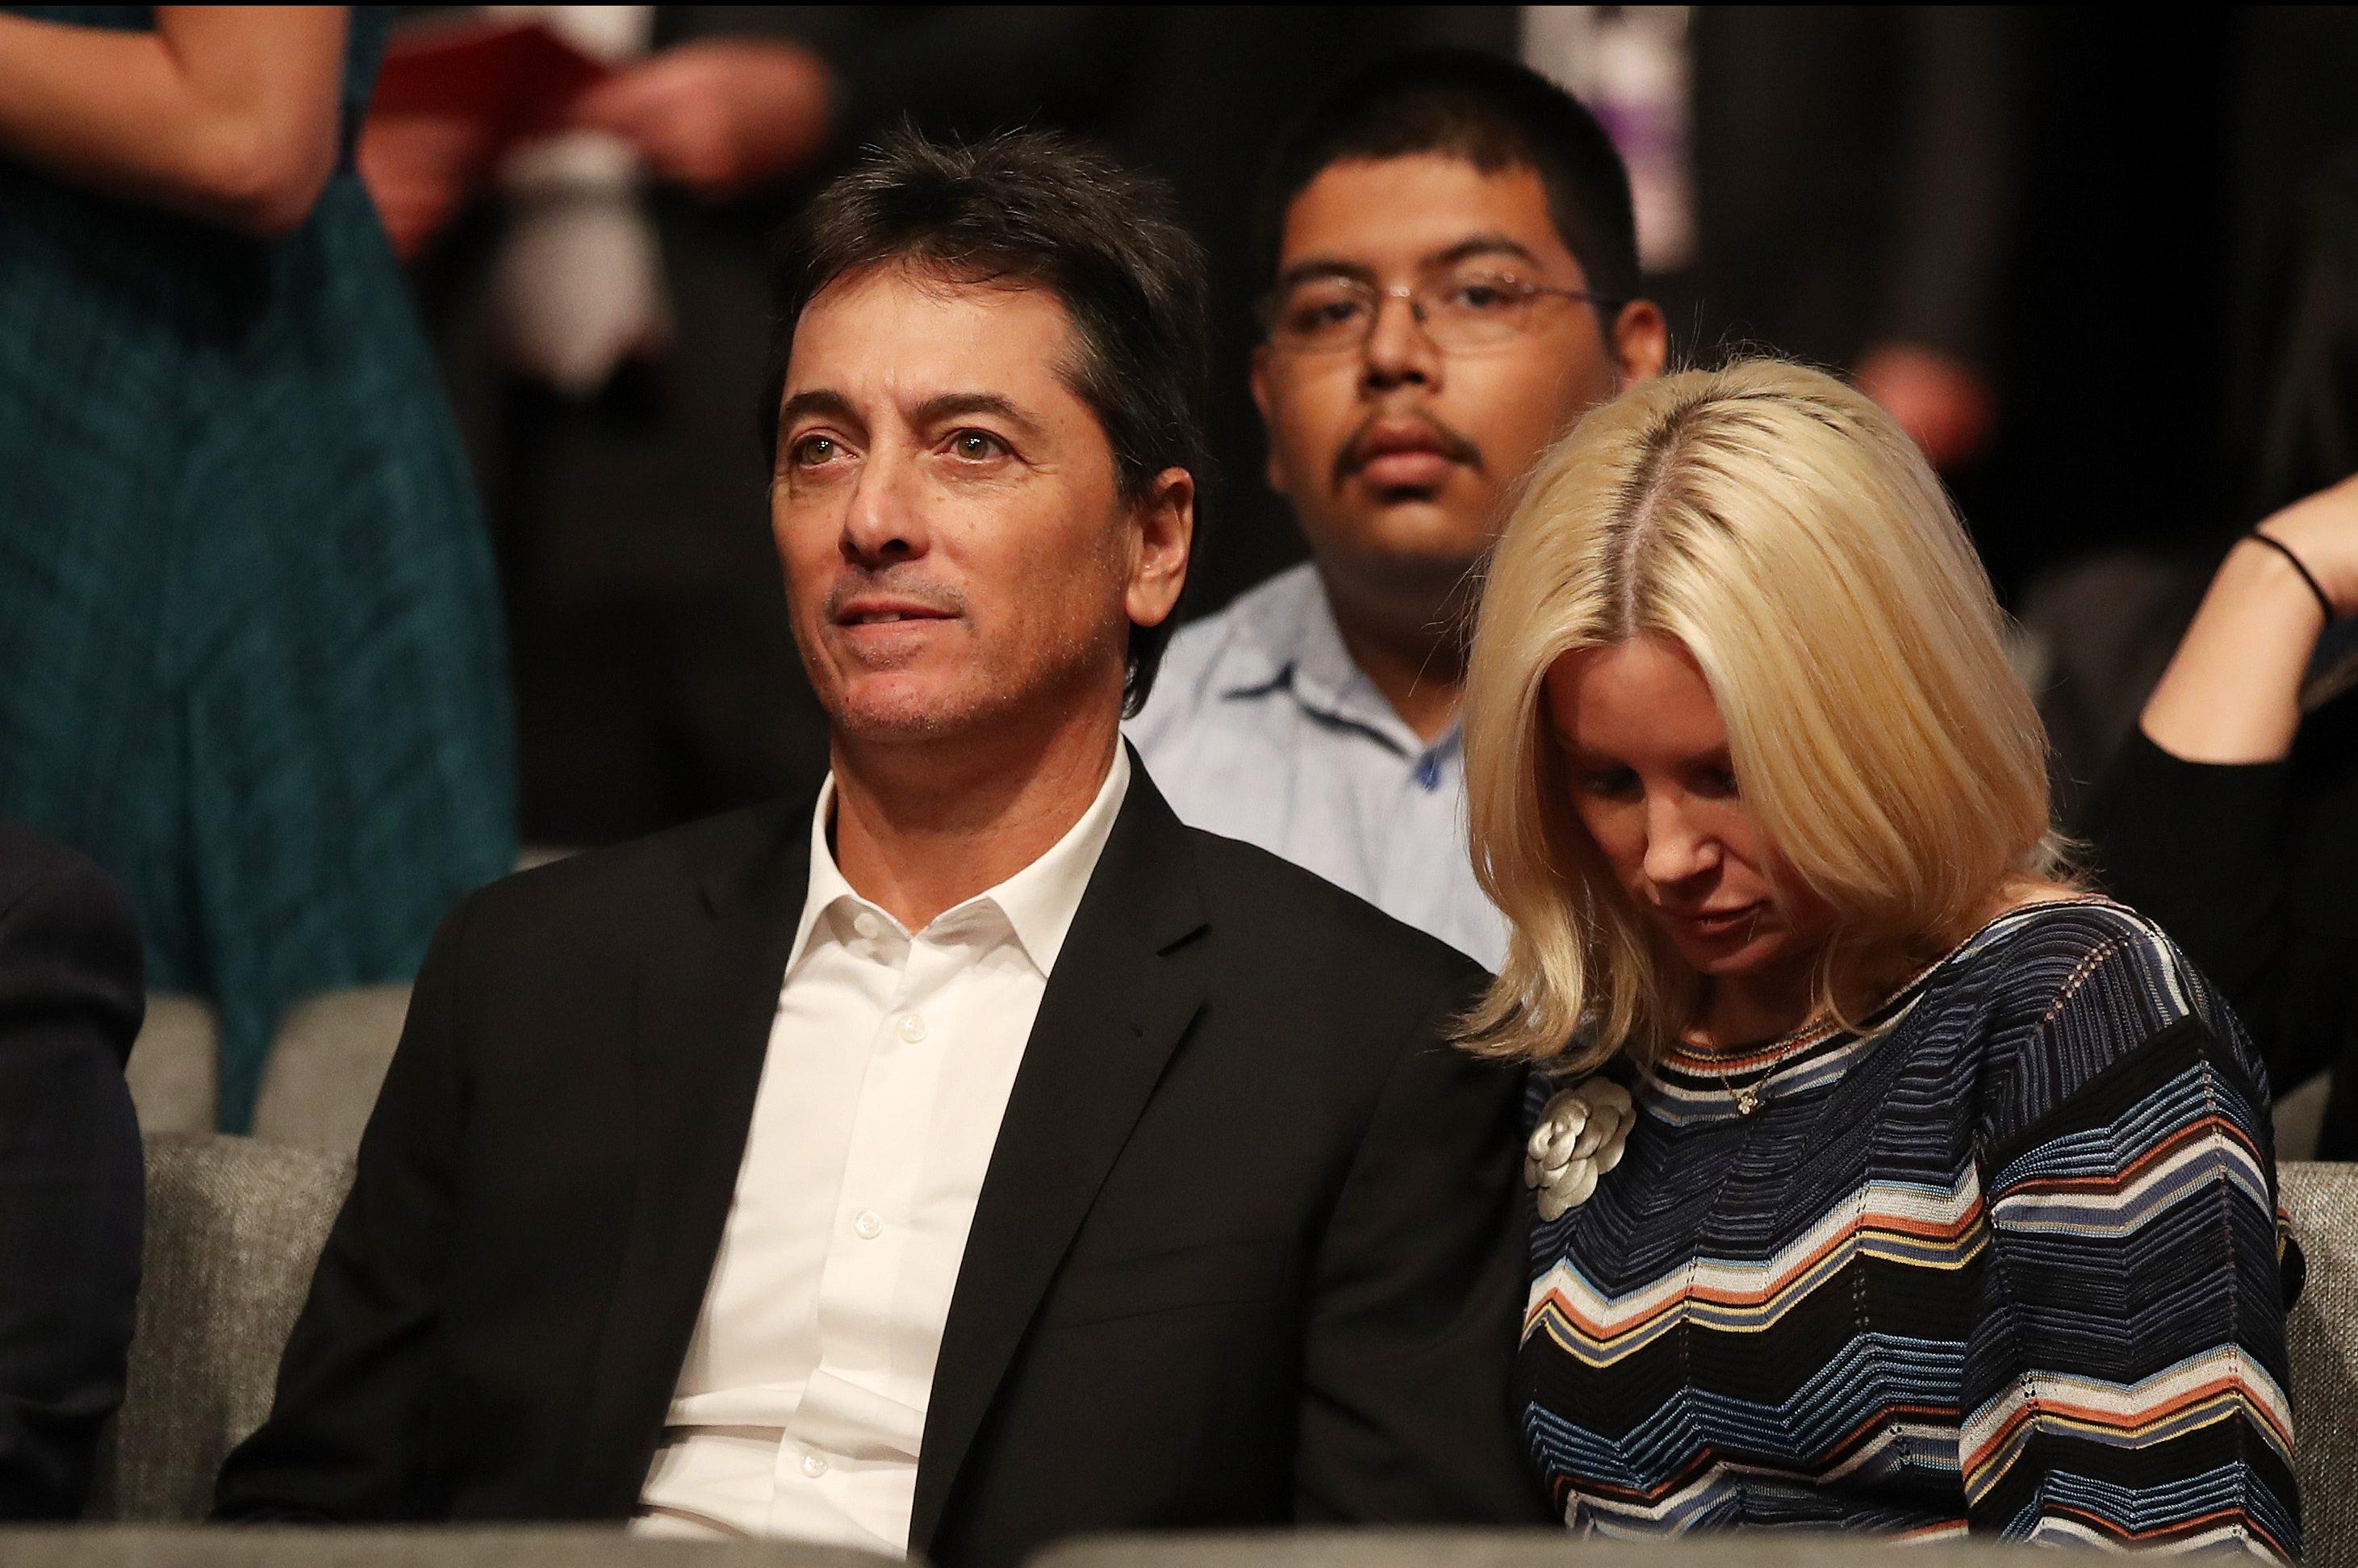 Scott Baio, wife, Renee Sloan, debate